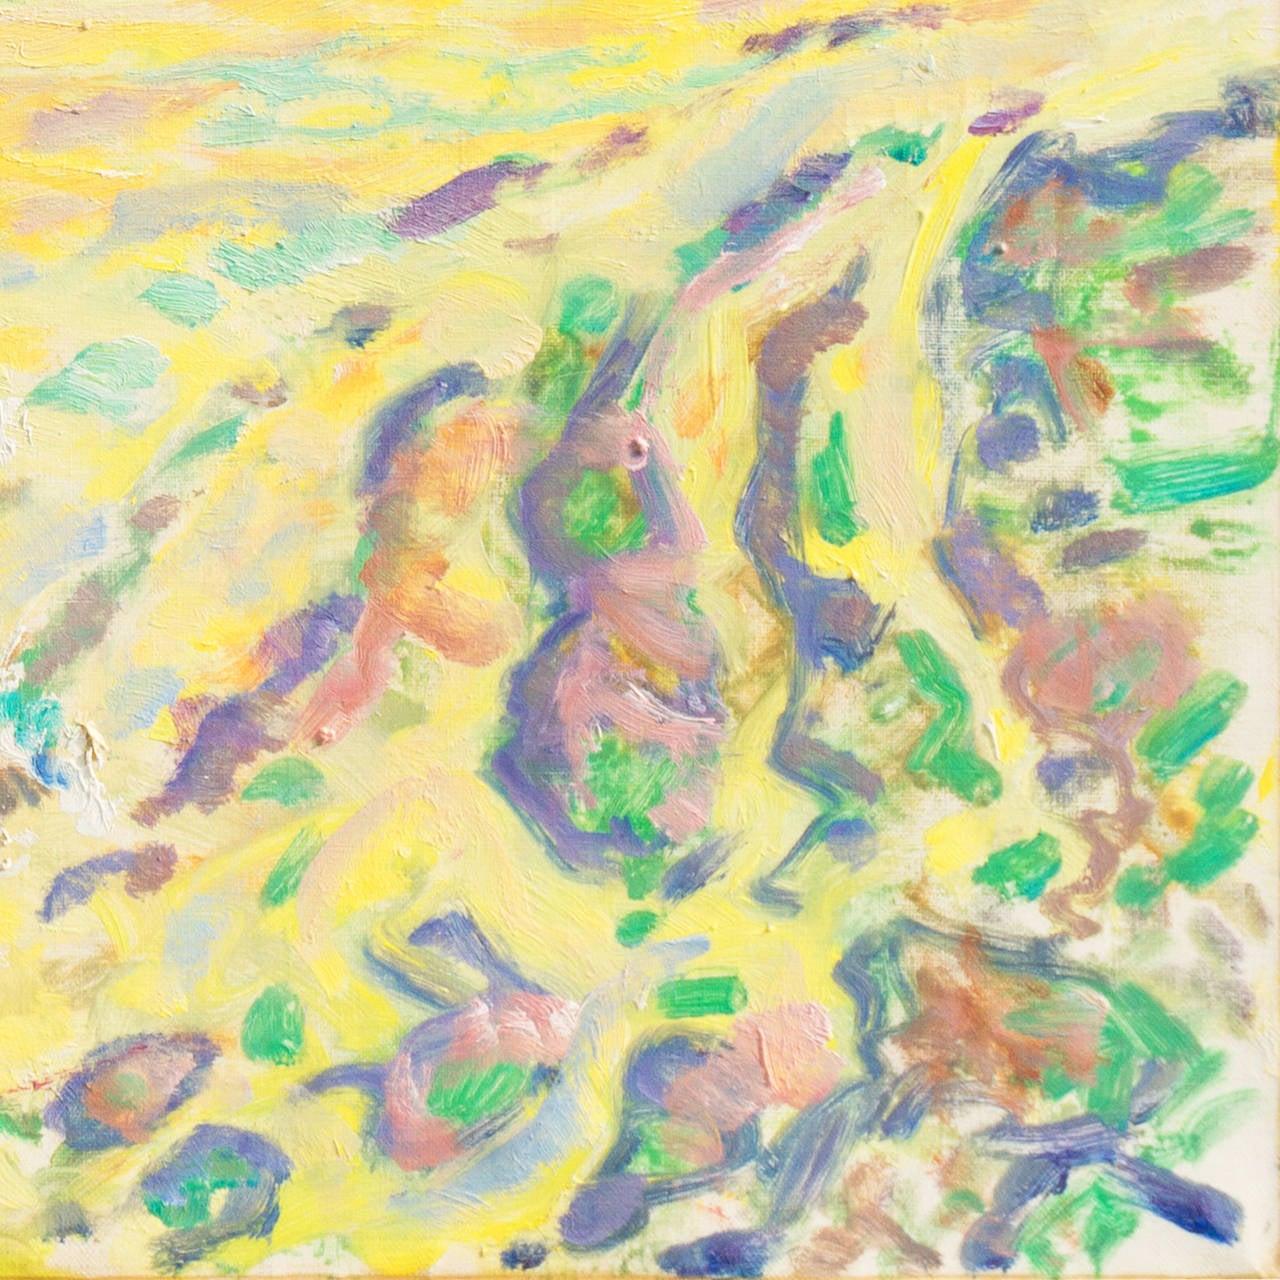 Spring Landscape - Painting by Ejnar R. Kragh